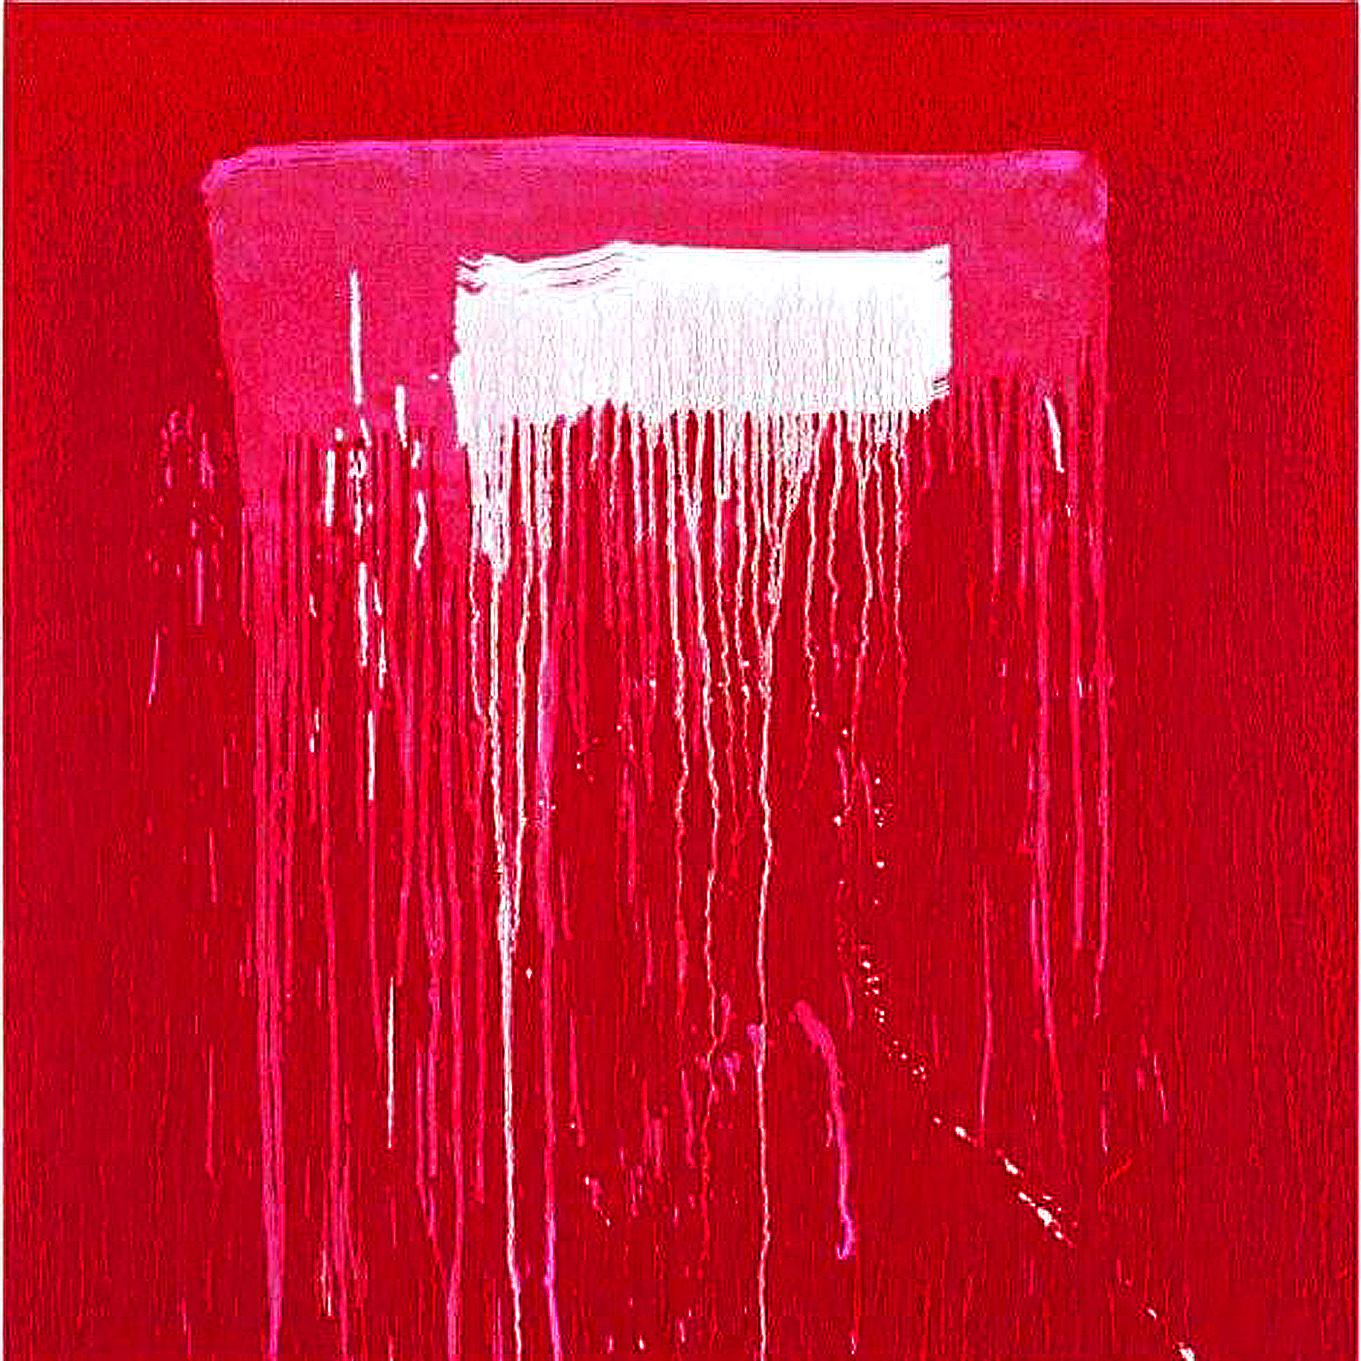 Norton Museum of Art, West Palm Beach, FL. - Online Auction: 25 January–8 February 2021 • 4:00 PM EST • New York. Image Credit: Pat Steir, courtesy by Norton Museum, FLA, 2020